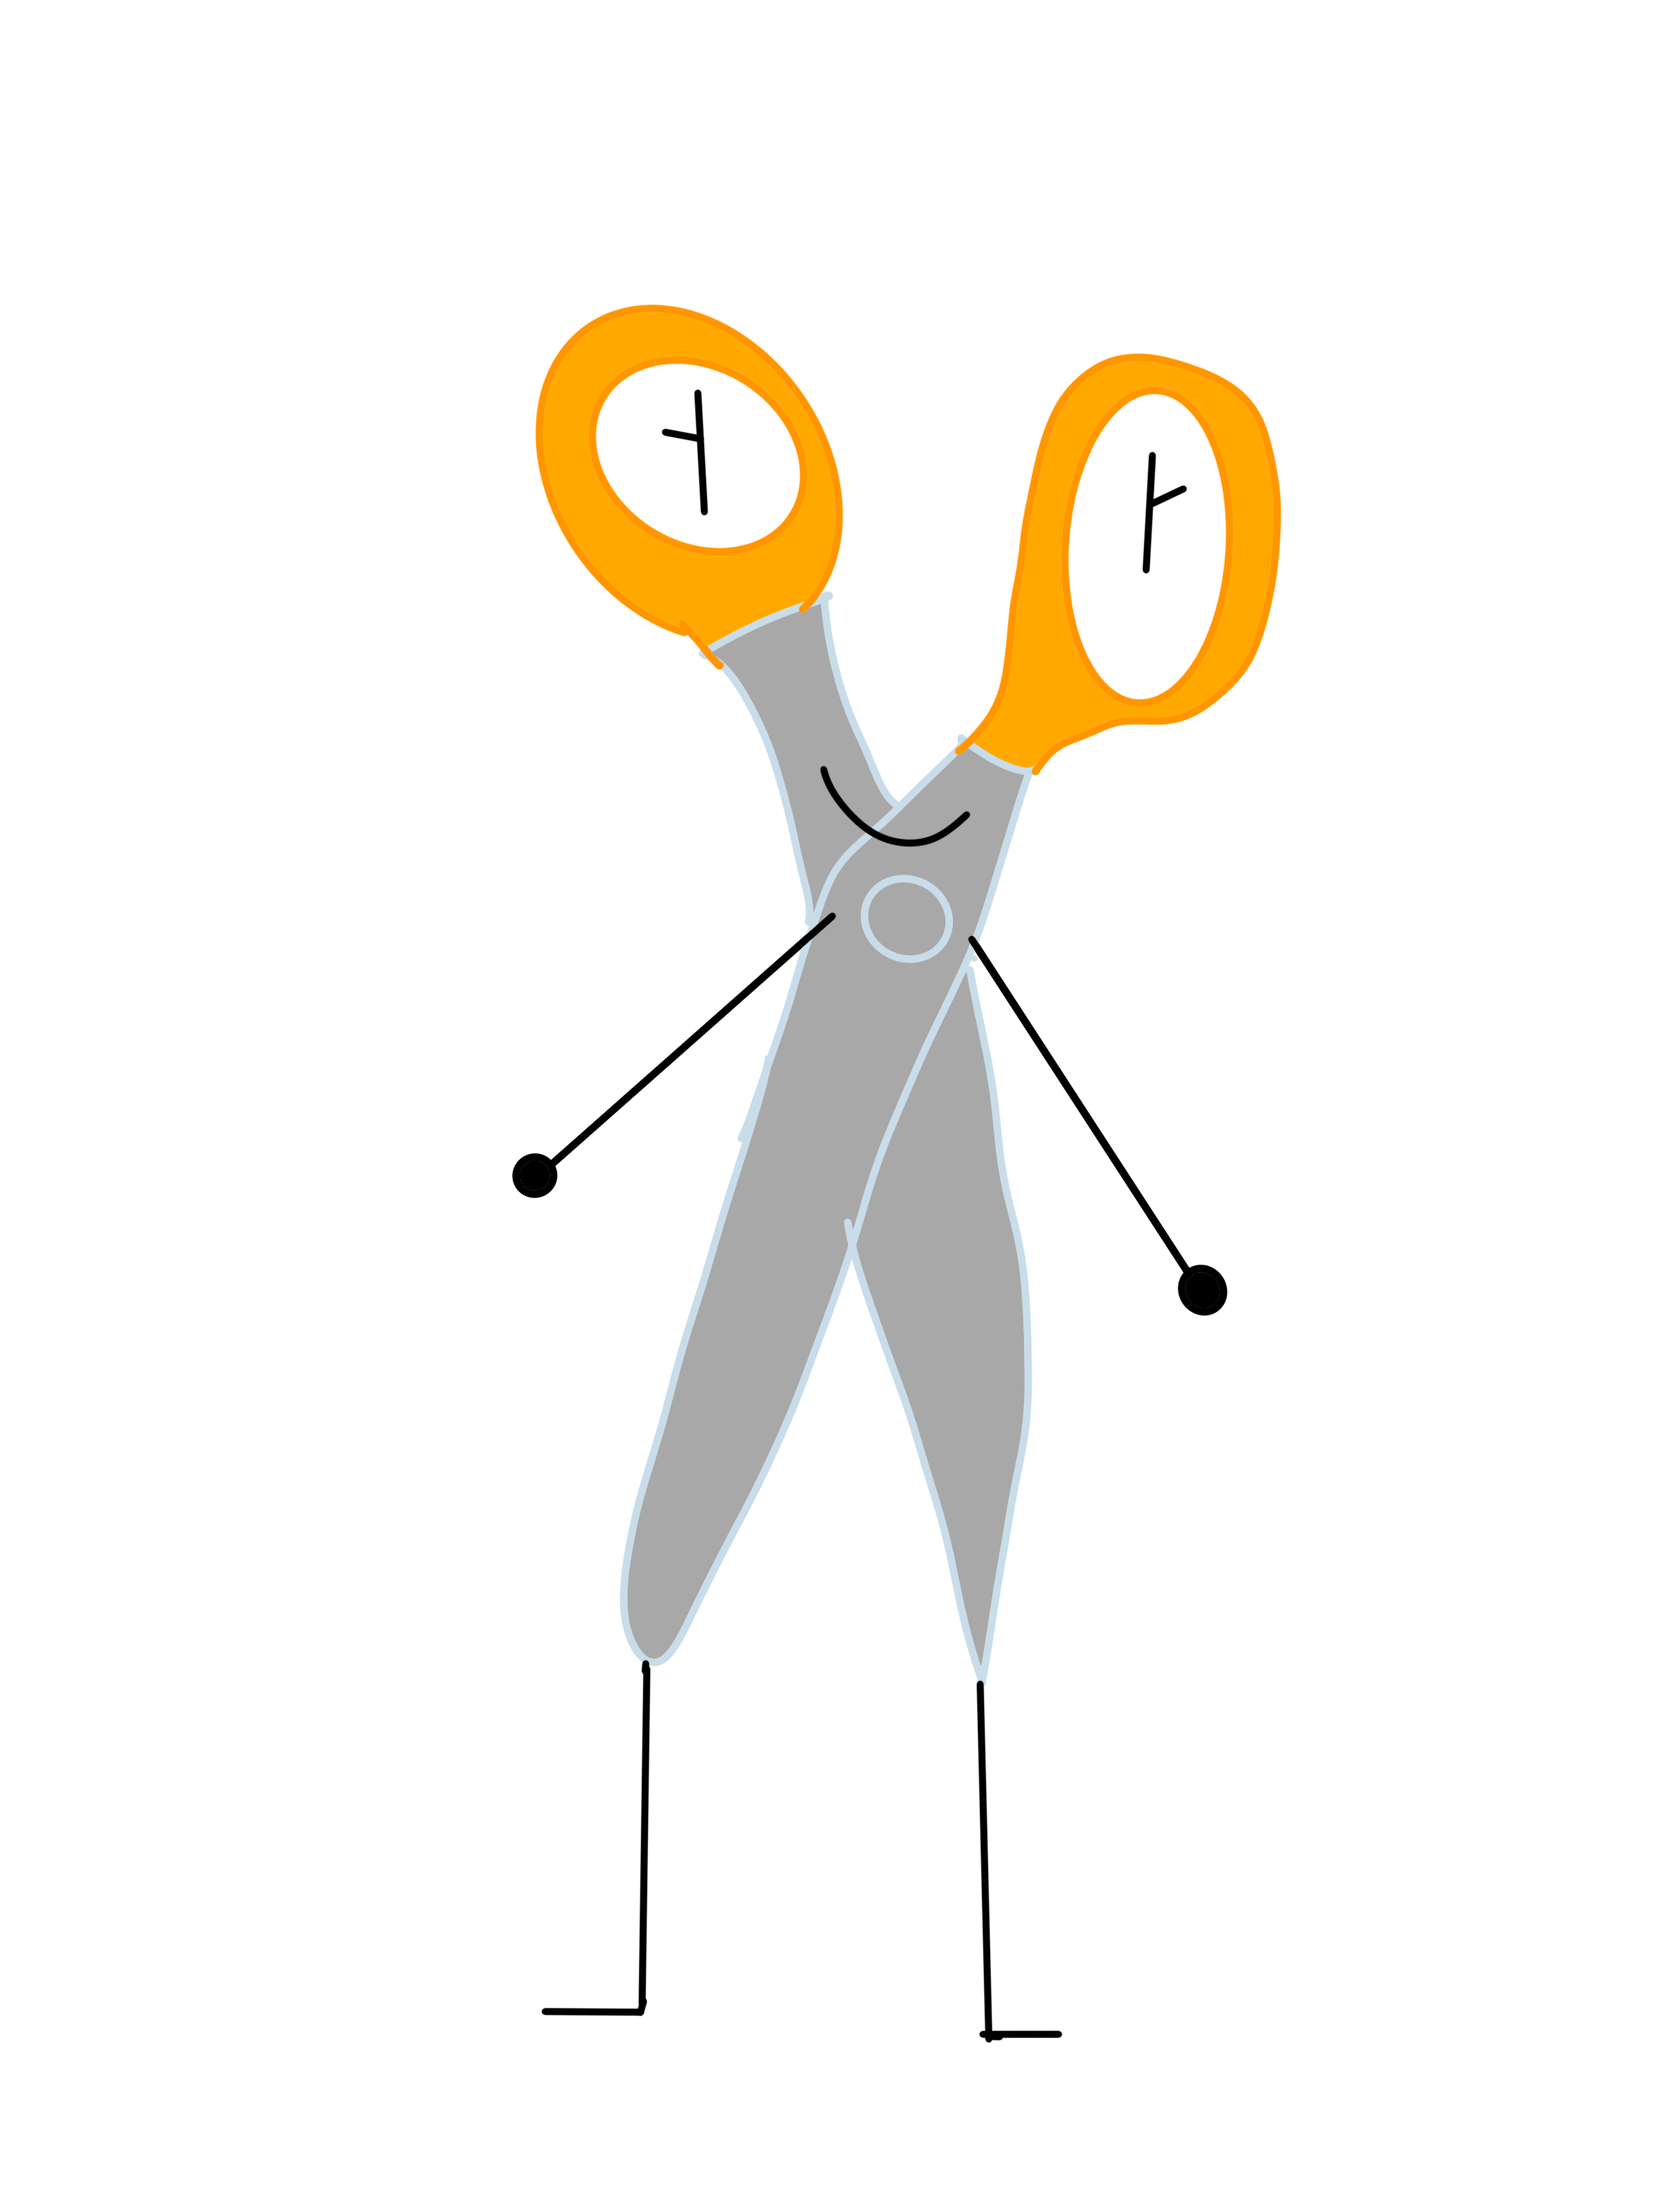 Scissors (4-Dimensional Objects)